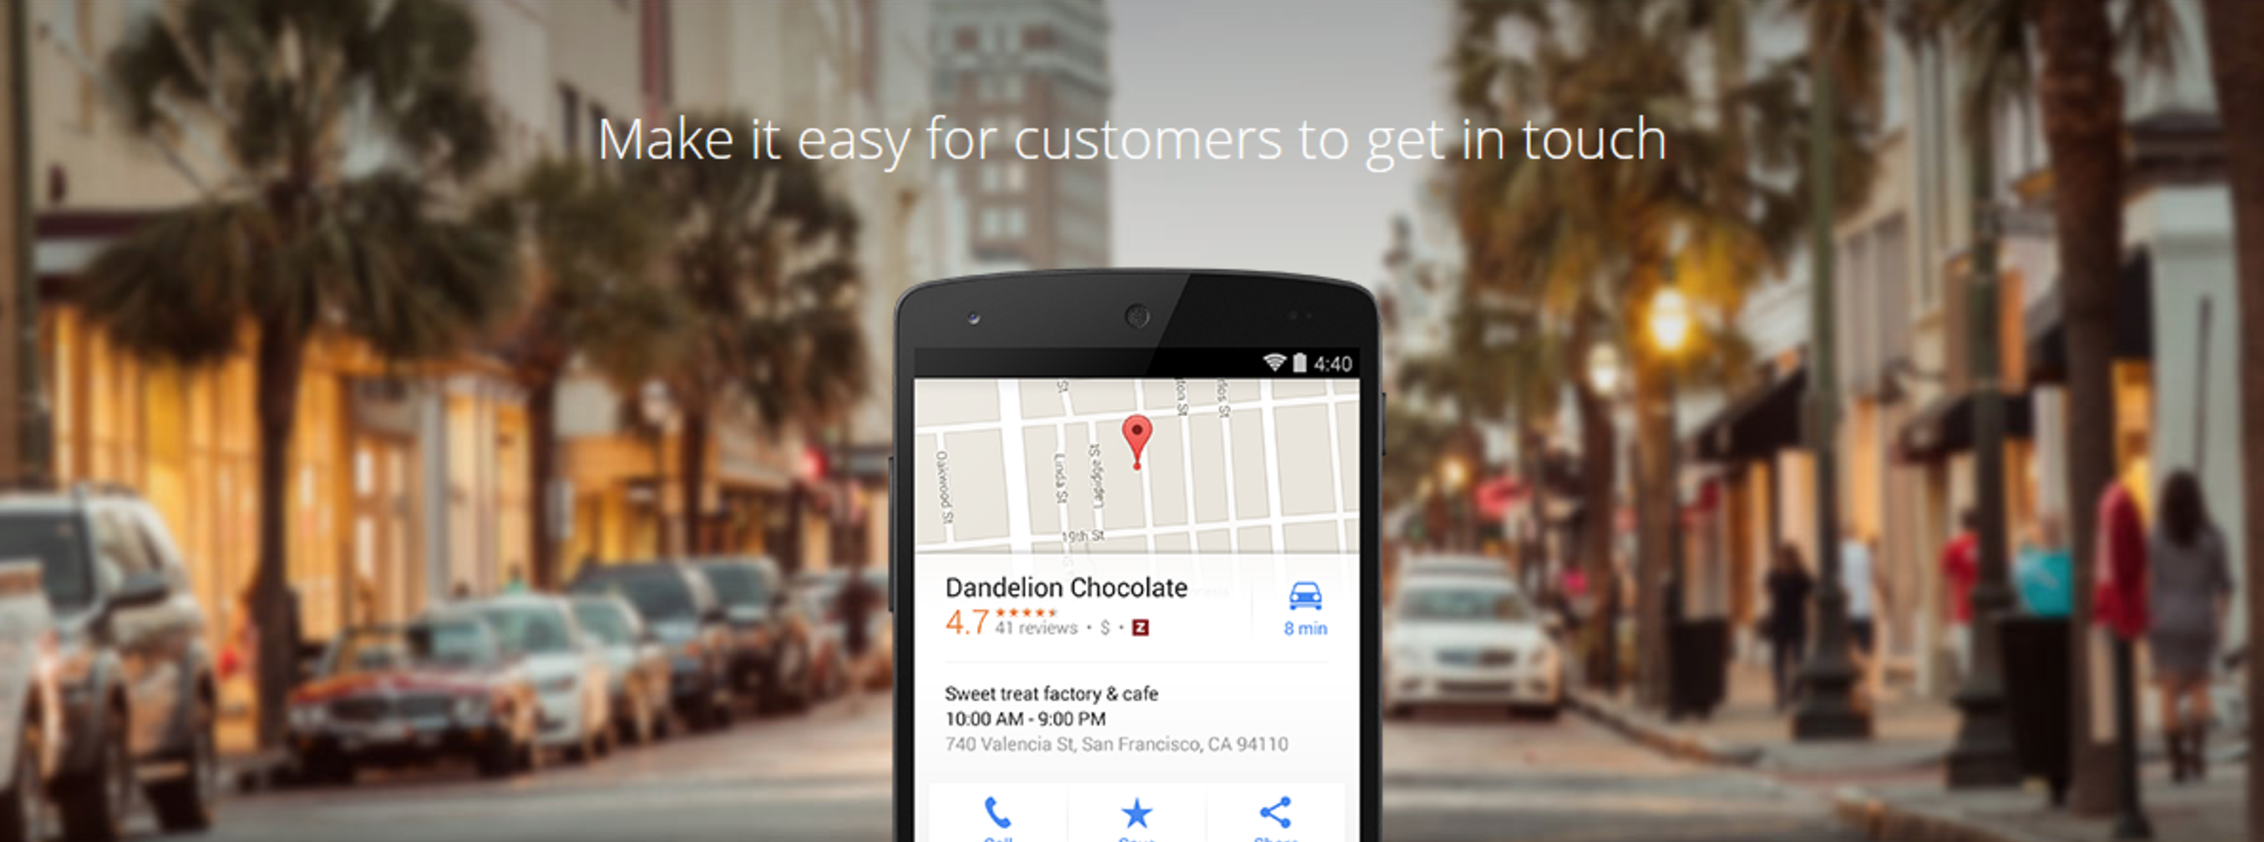 cheers-studios-digital-branding-studio-columbus-ohio-Google-Businesses-example.png